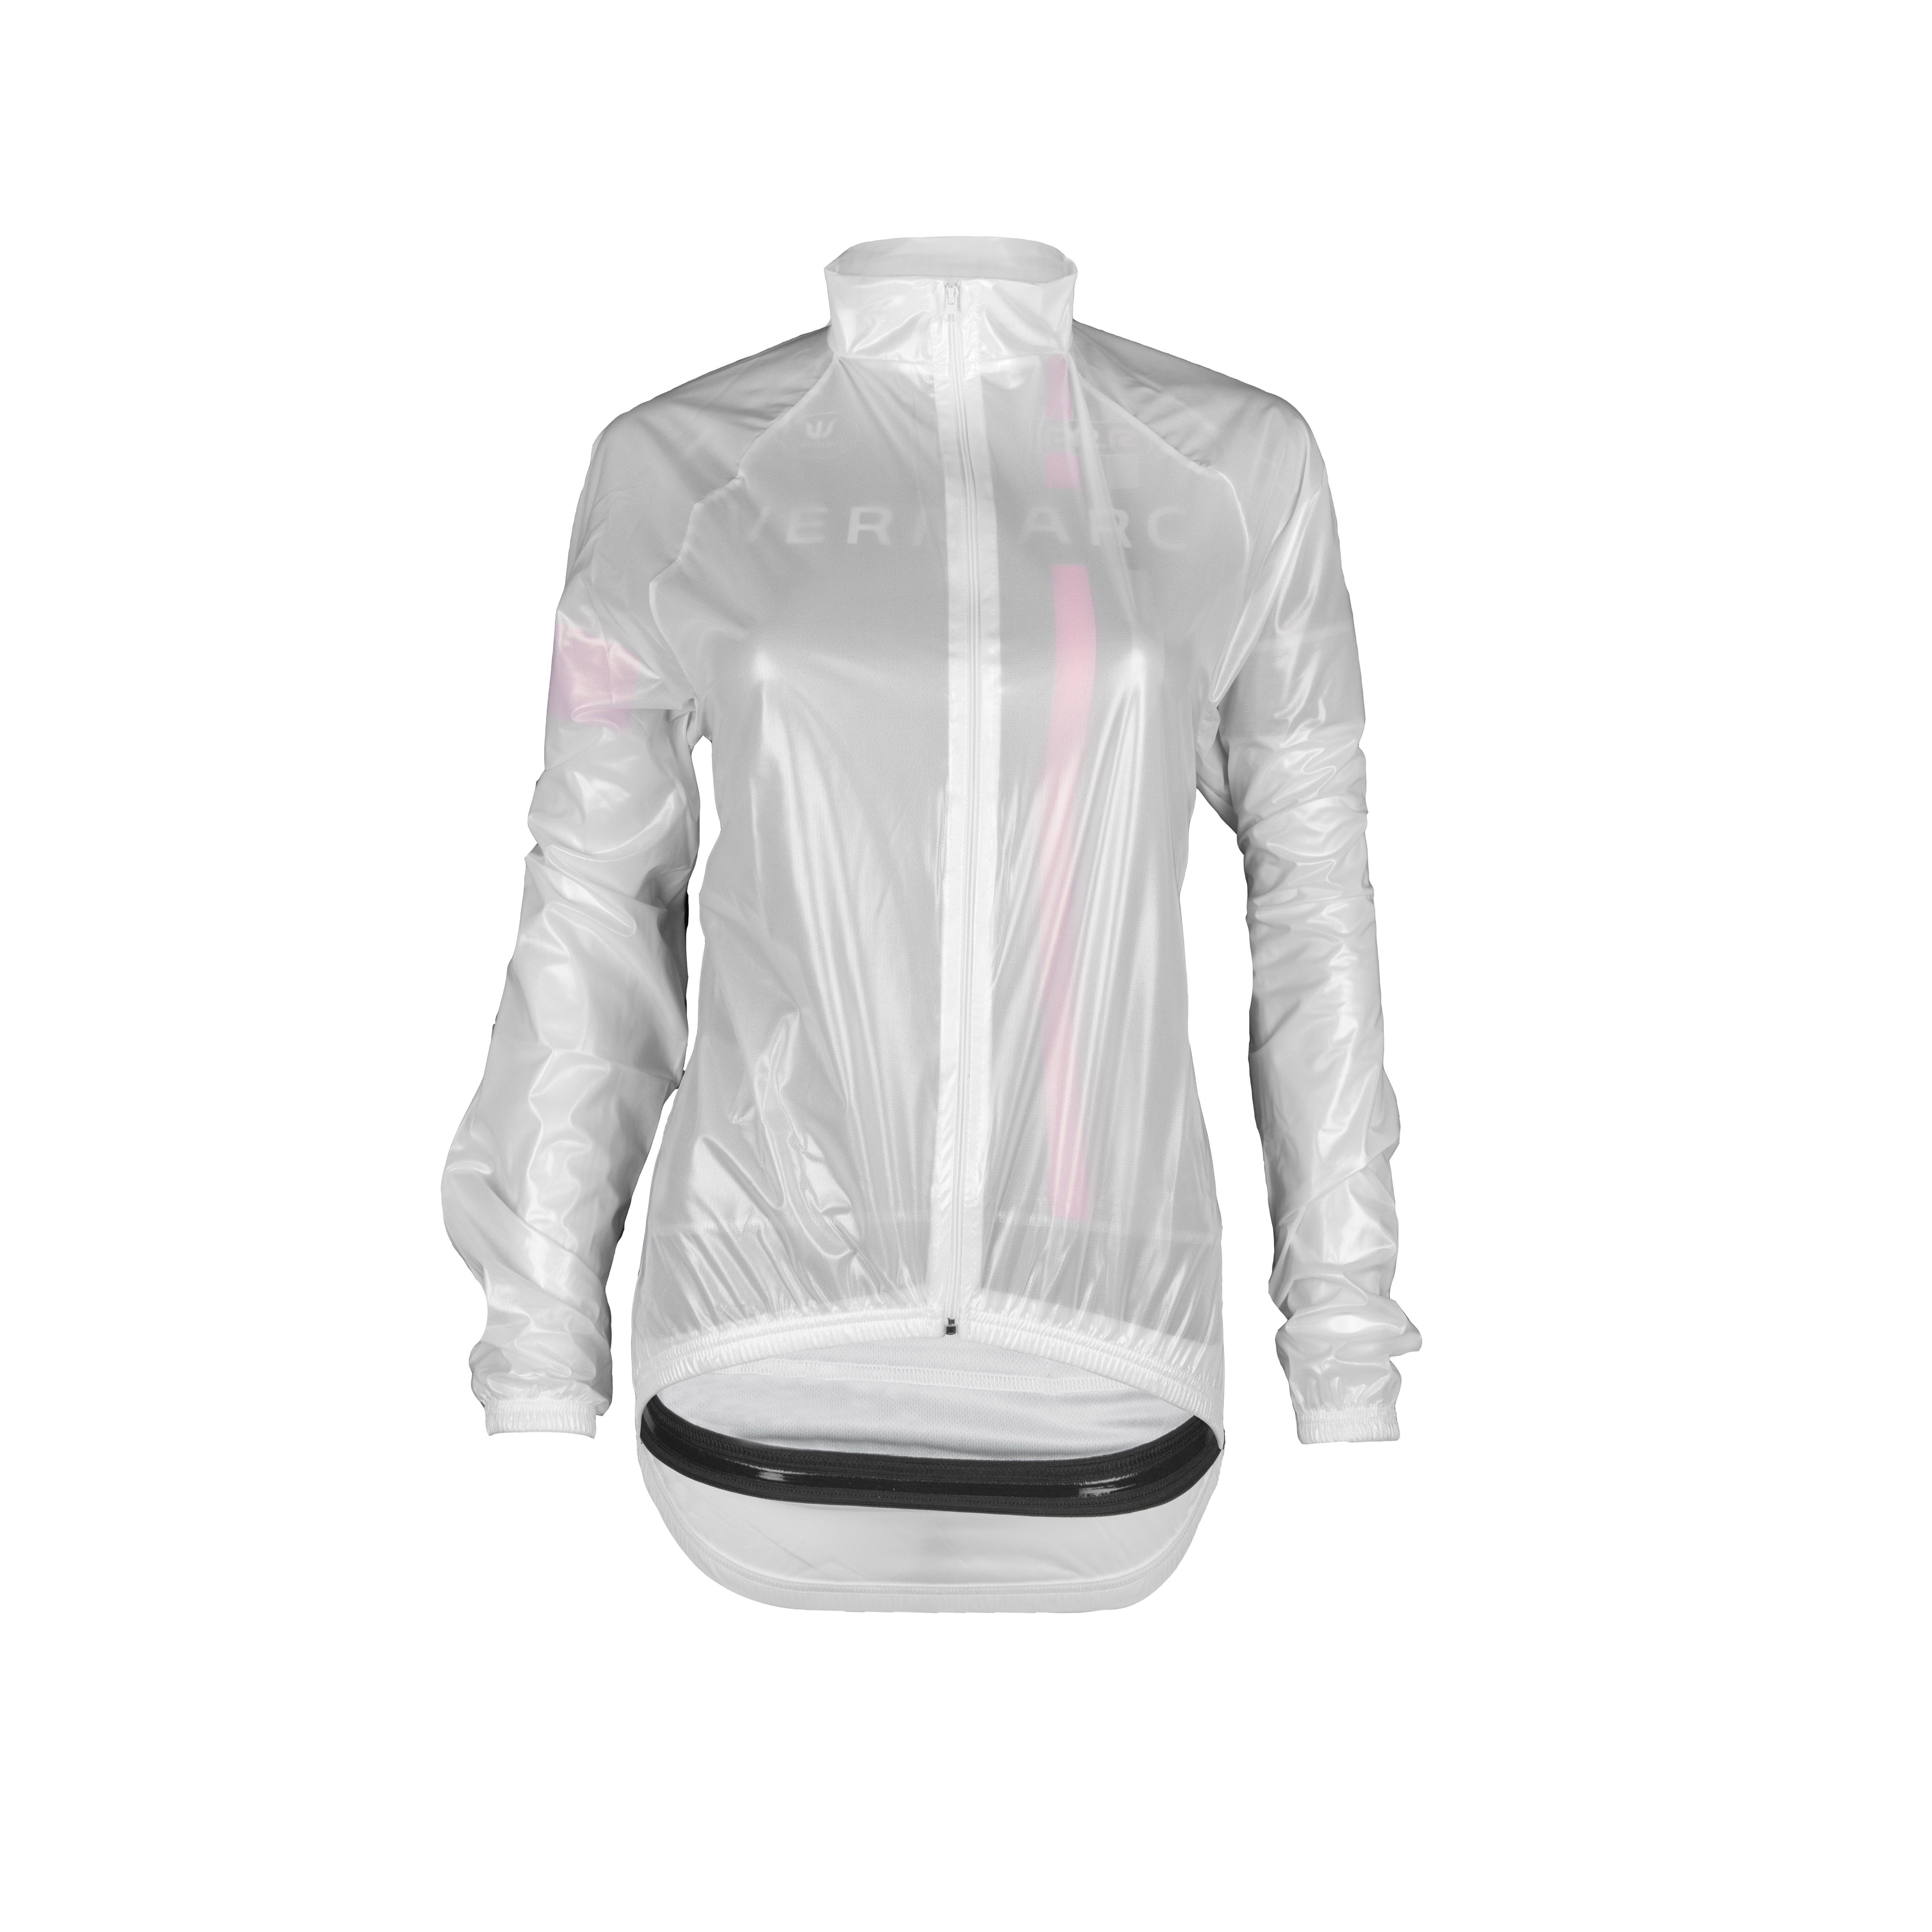 Rainjacket Long Sleeves Transparent Women